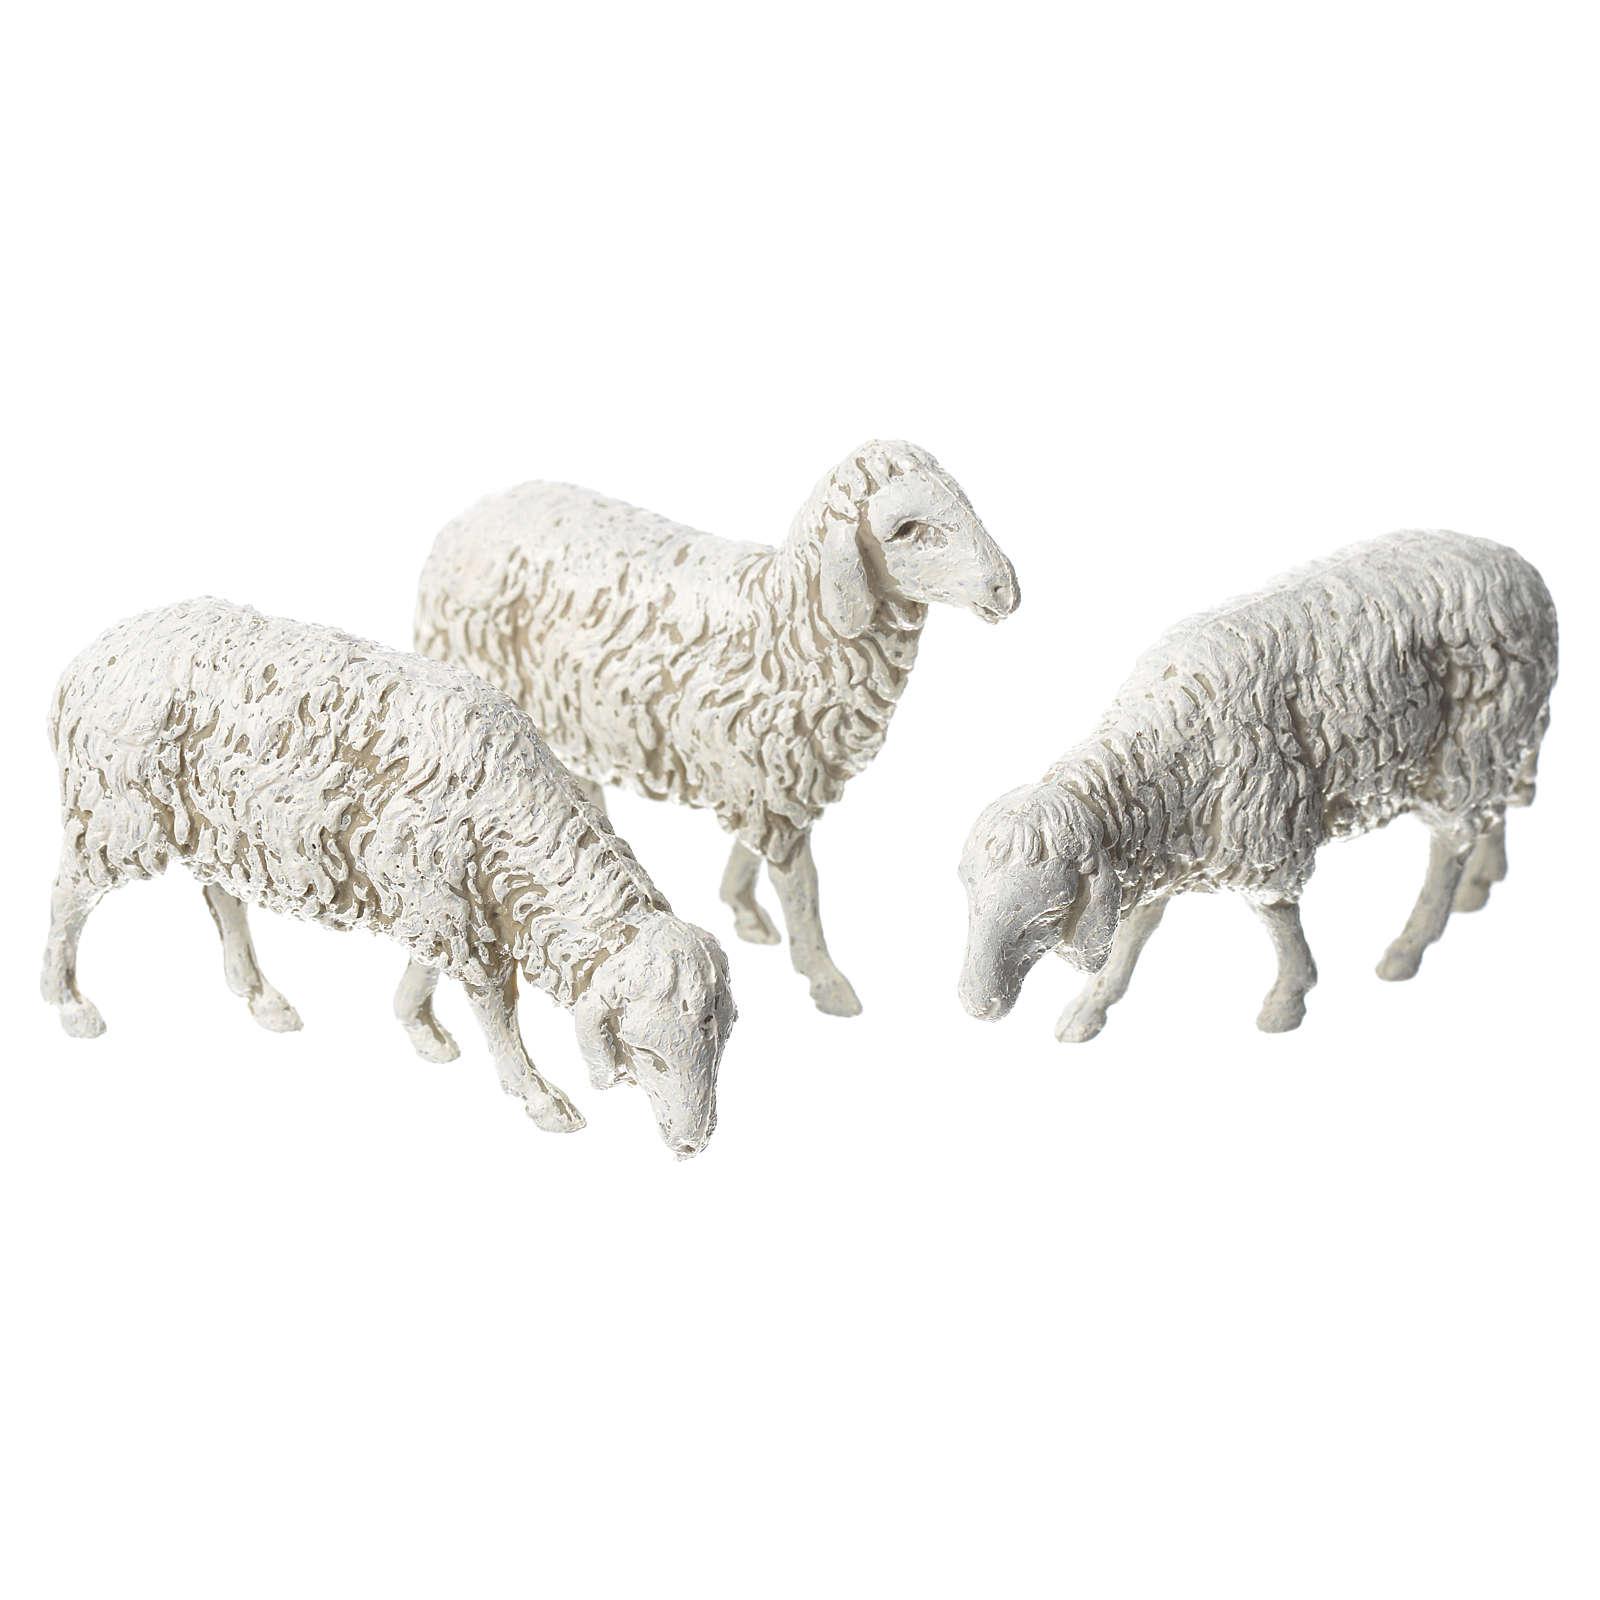 Capra cane e pecore 8 pz Moranduzzo 10 cm 4